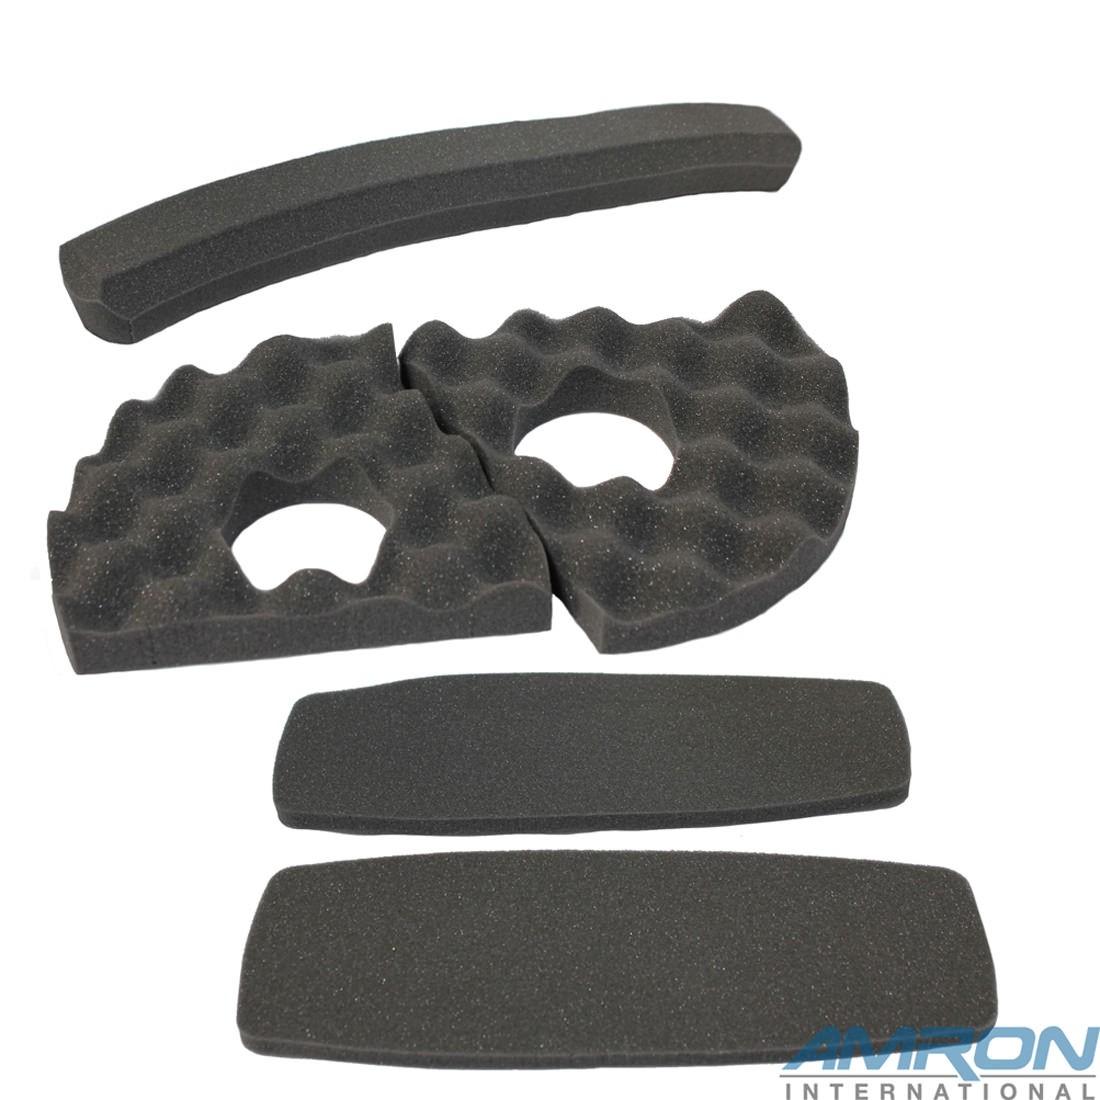 Kirby Morgan Replacement Head Cushion Foam Set 510-523